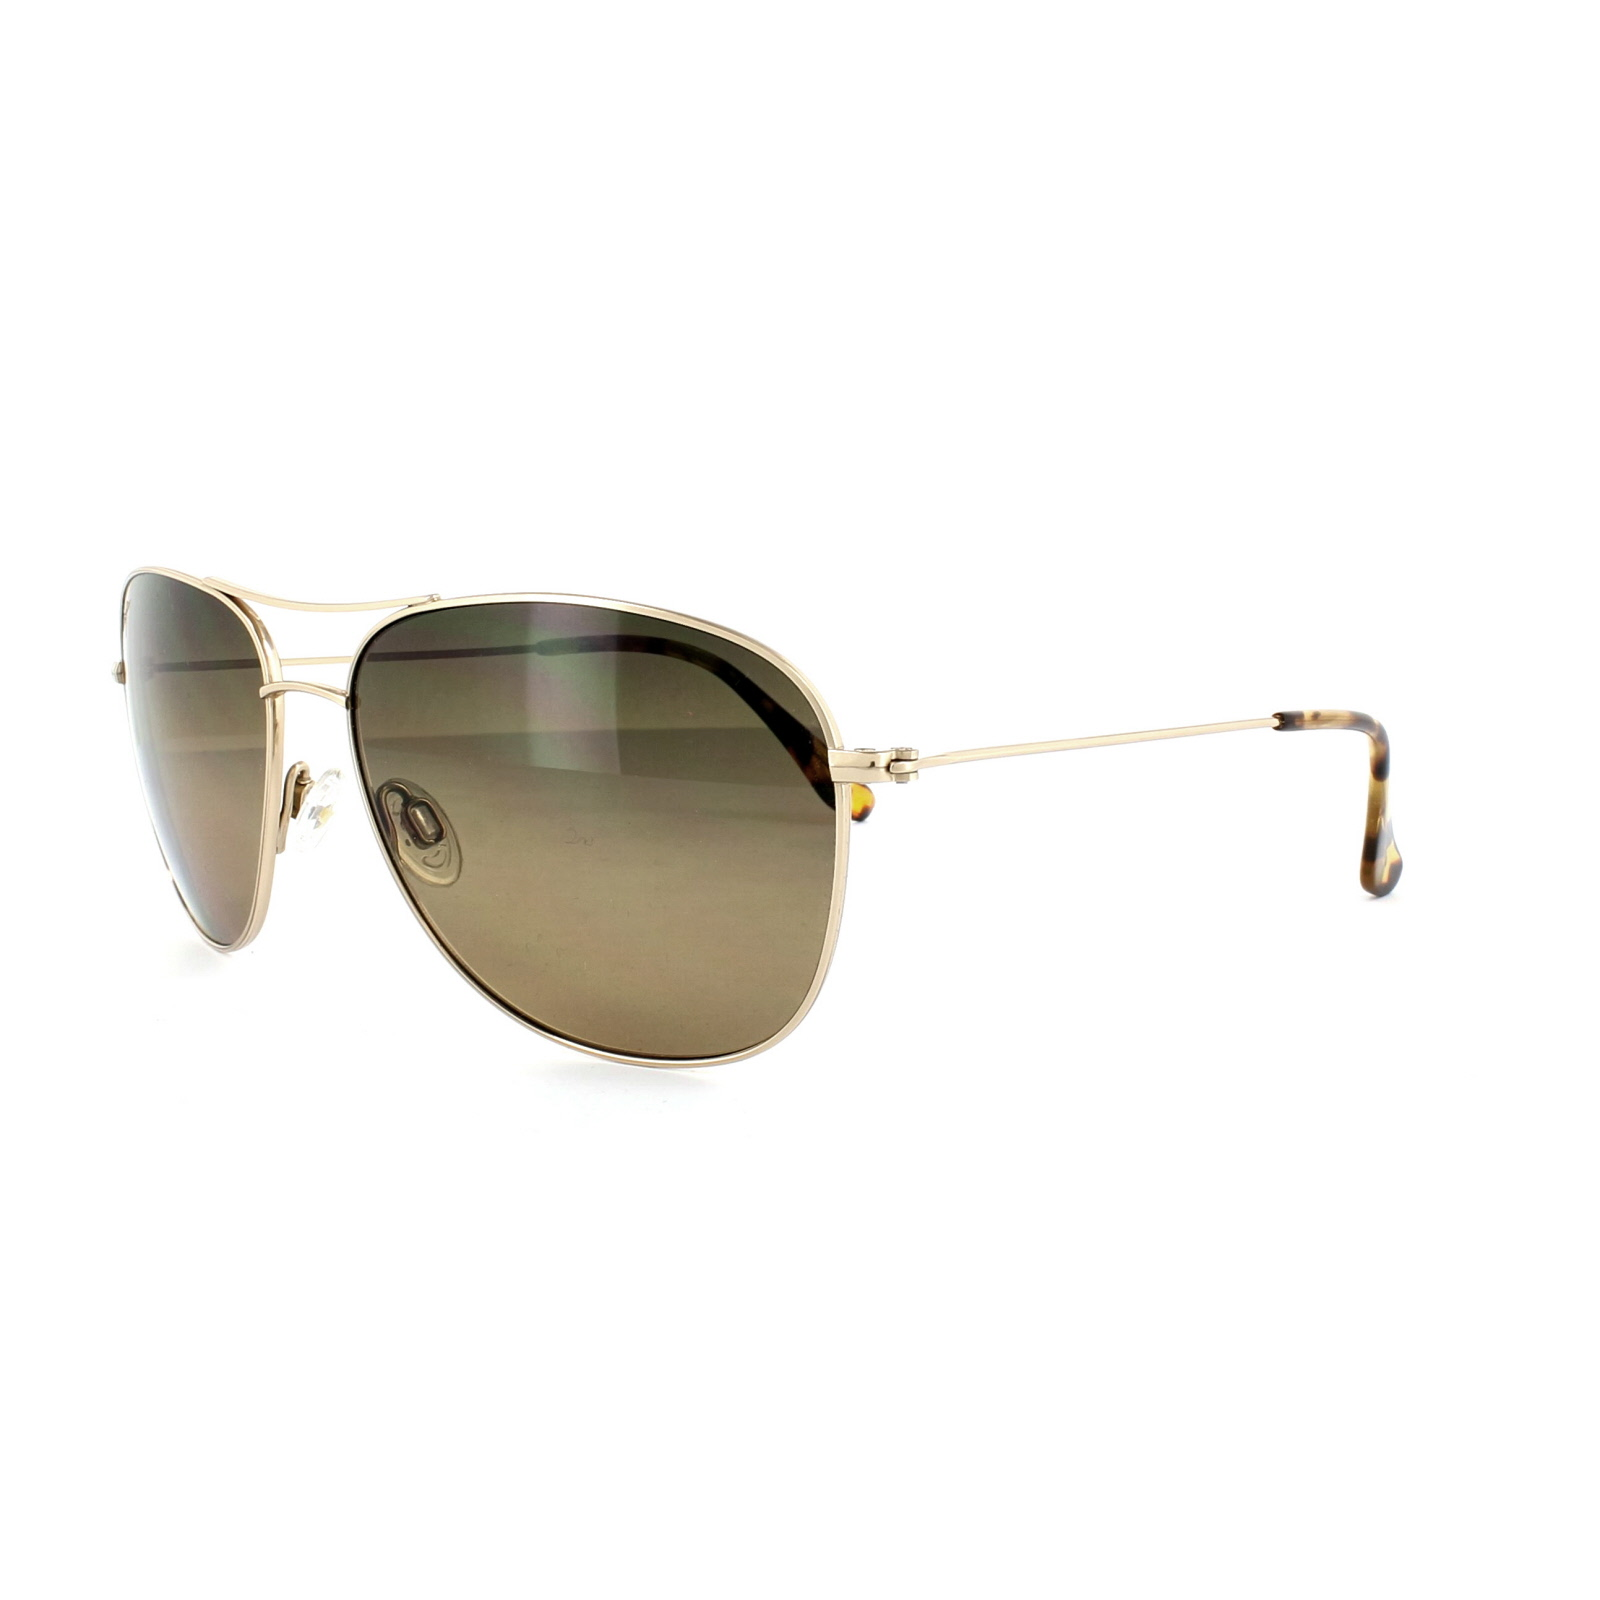 c37a436352f2 Maui Jim Sunglasses Sale Australia